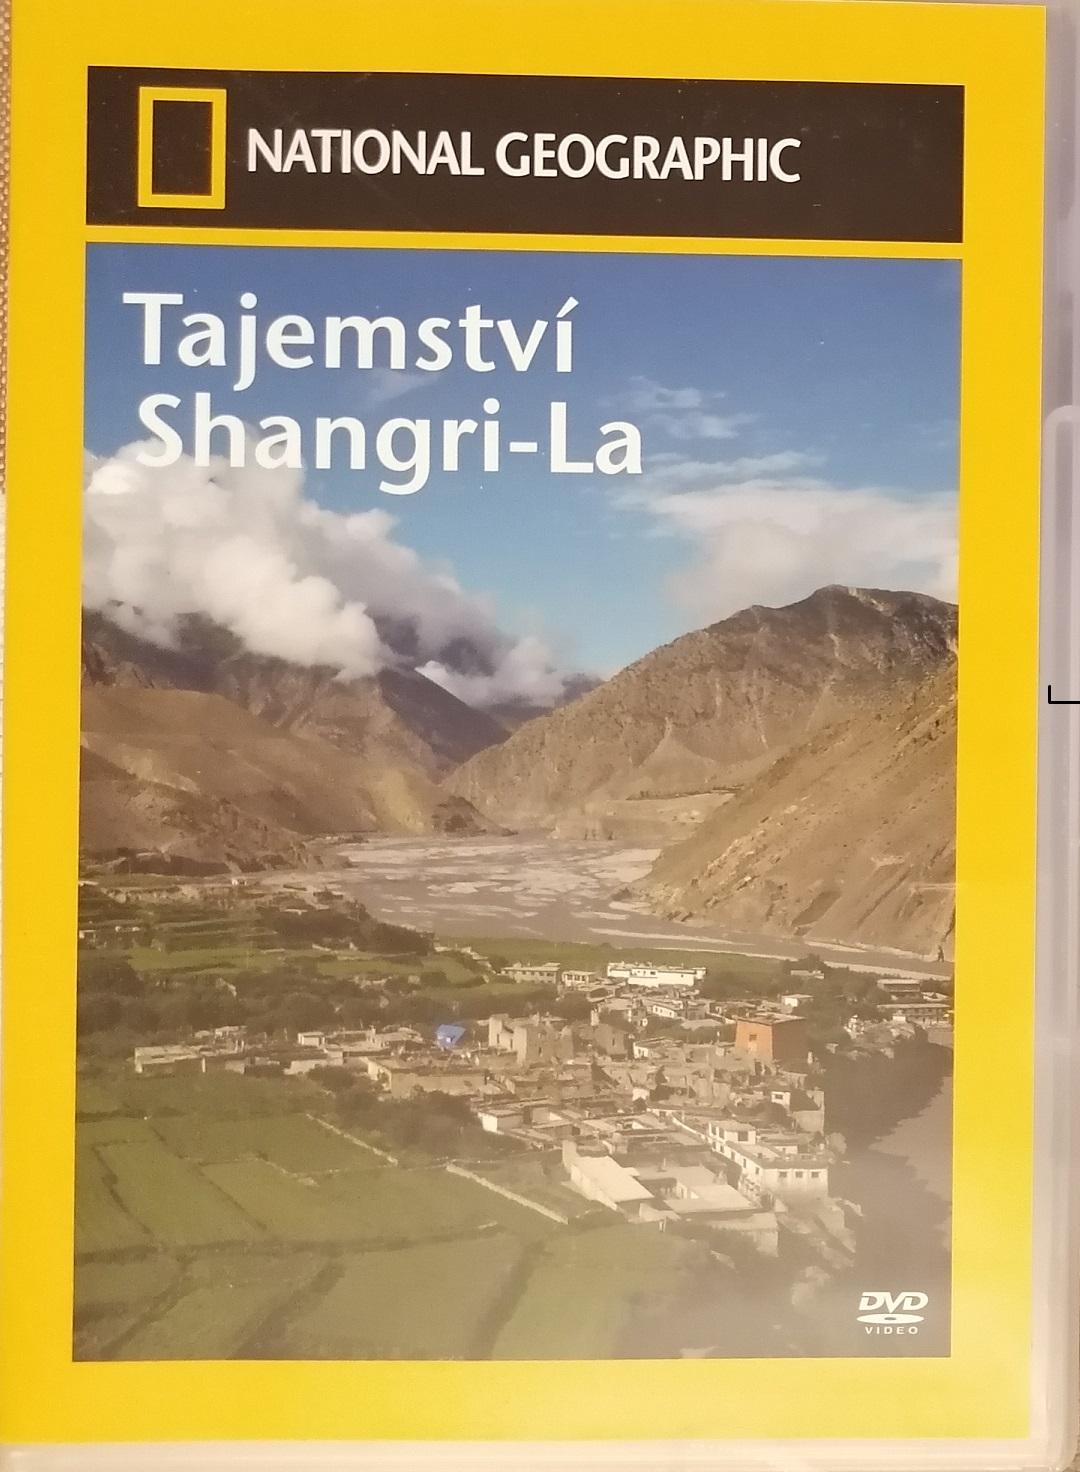 Tajemství Shangri-La ( National Geoghraphic) - DVD plast